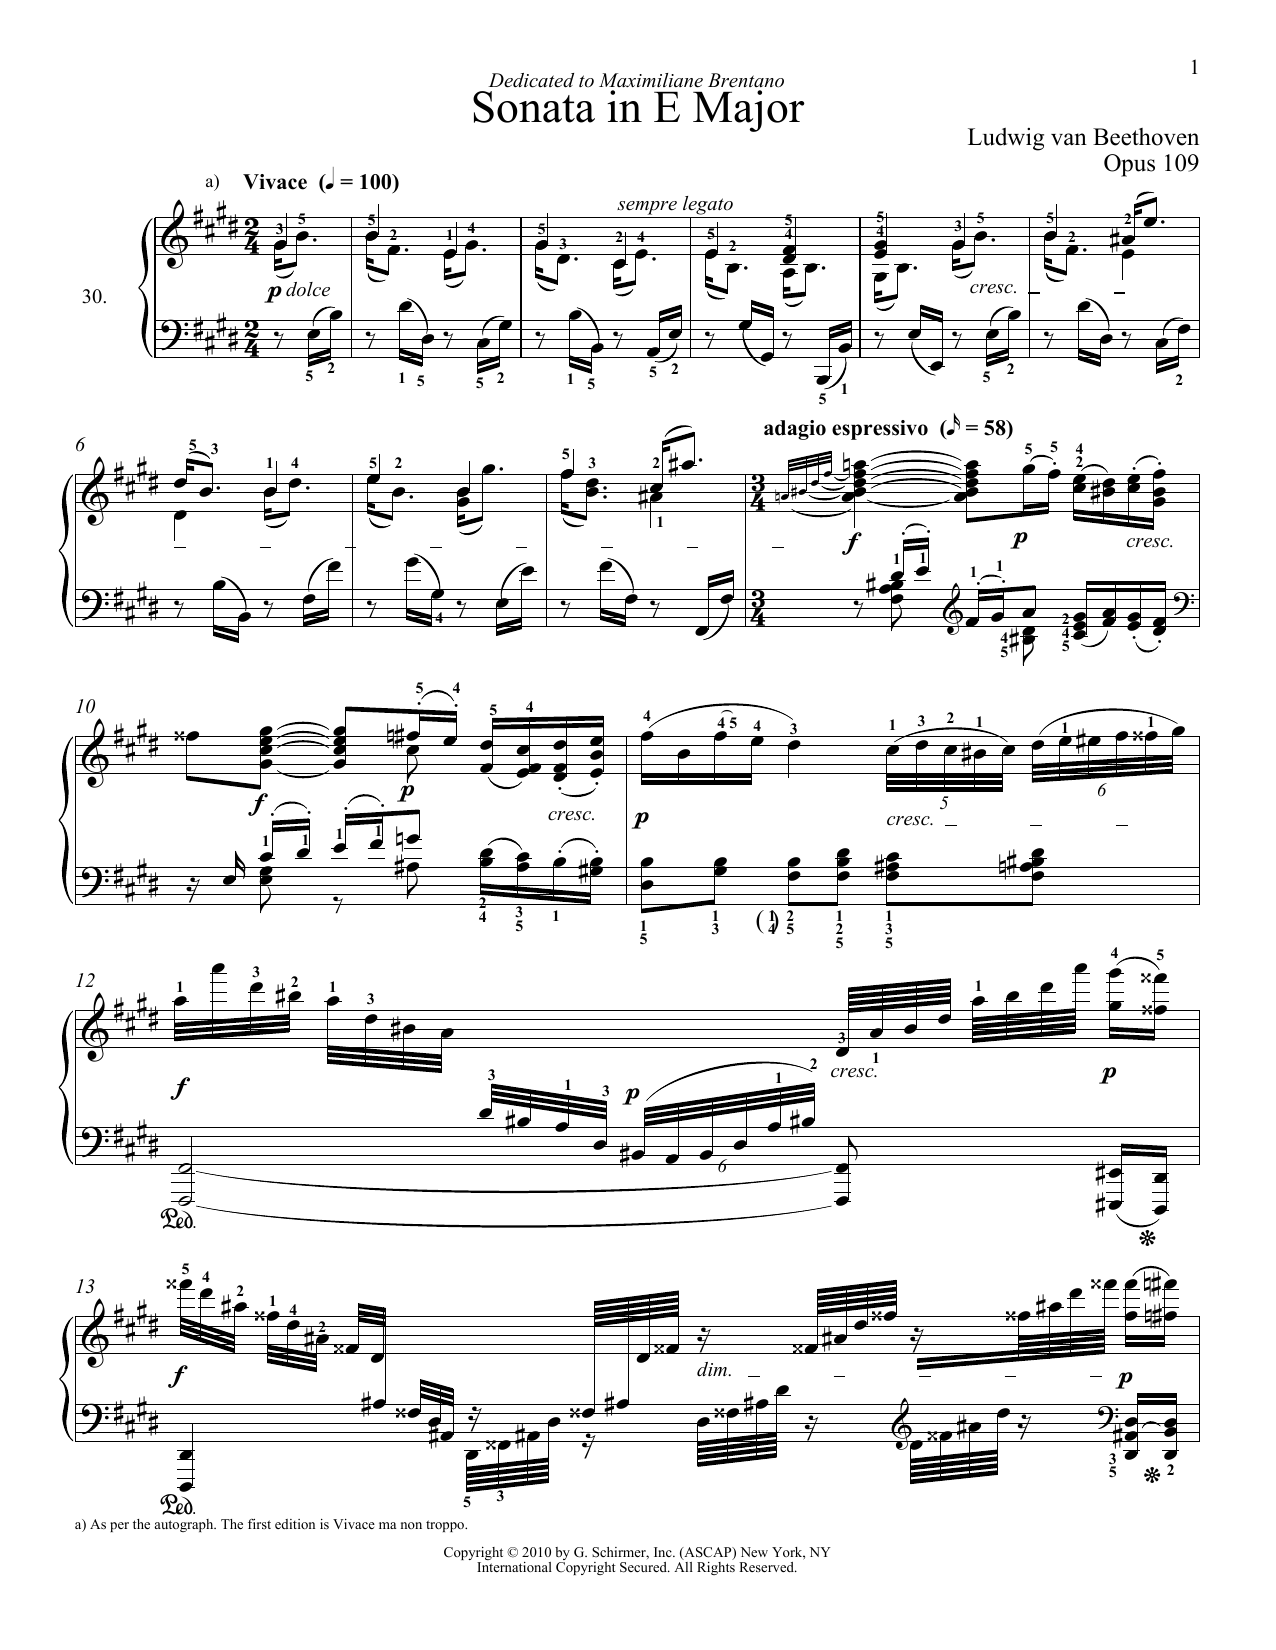 Ludwig van Beethoven Piano Sonata No. 30 In E Major, Op. 109 sheet music notes and chords. Download Printable PDF.